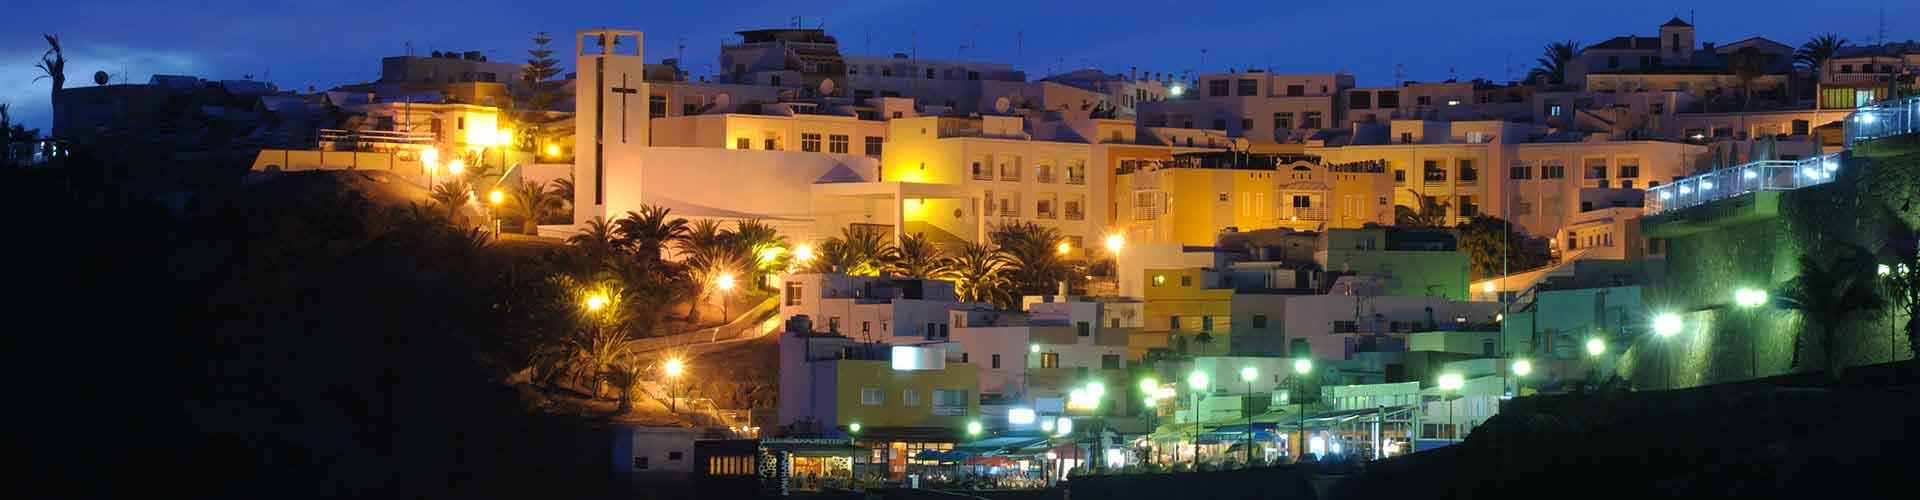 Fuerteventura - Camping à Fuerteventura. Cartes pour Fuerteventura, photos et commentaires pour chaque Camping à Fuerteventura.